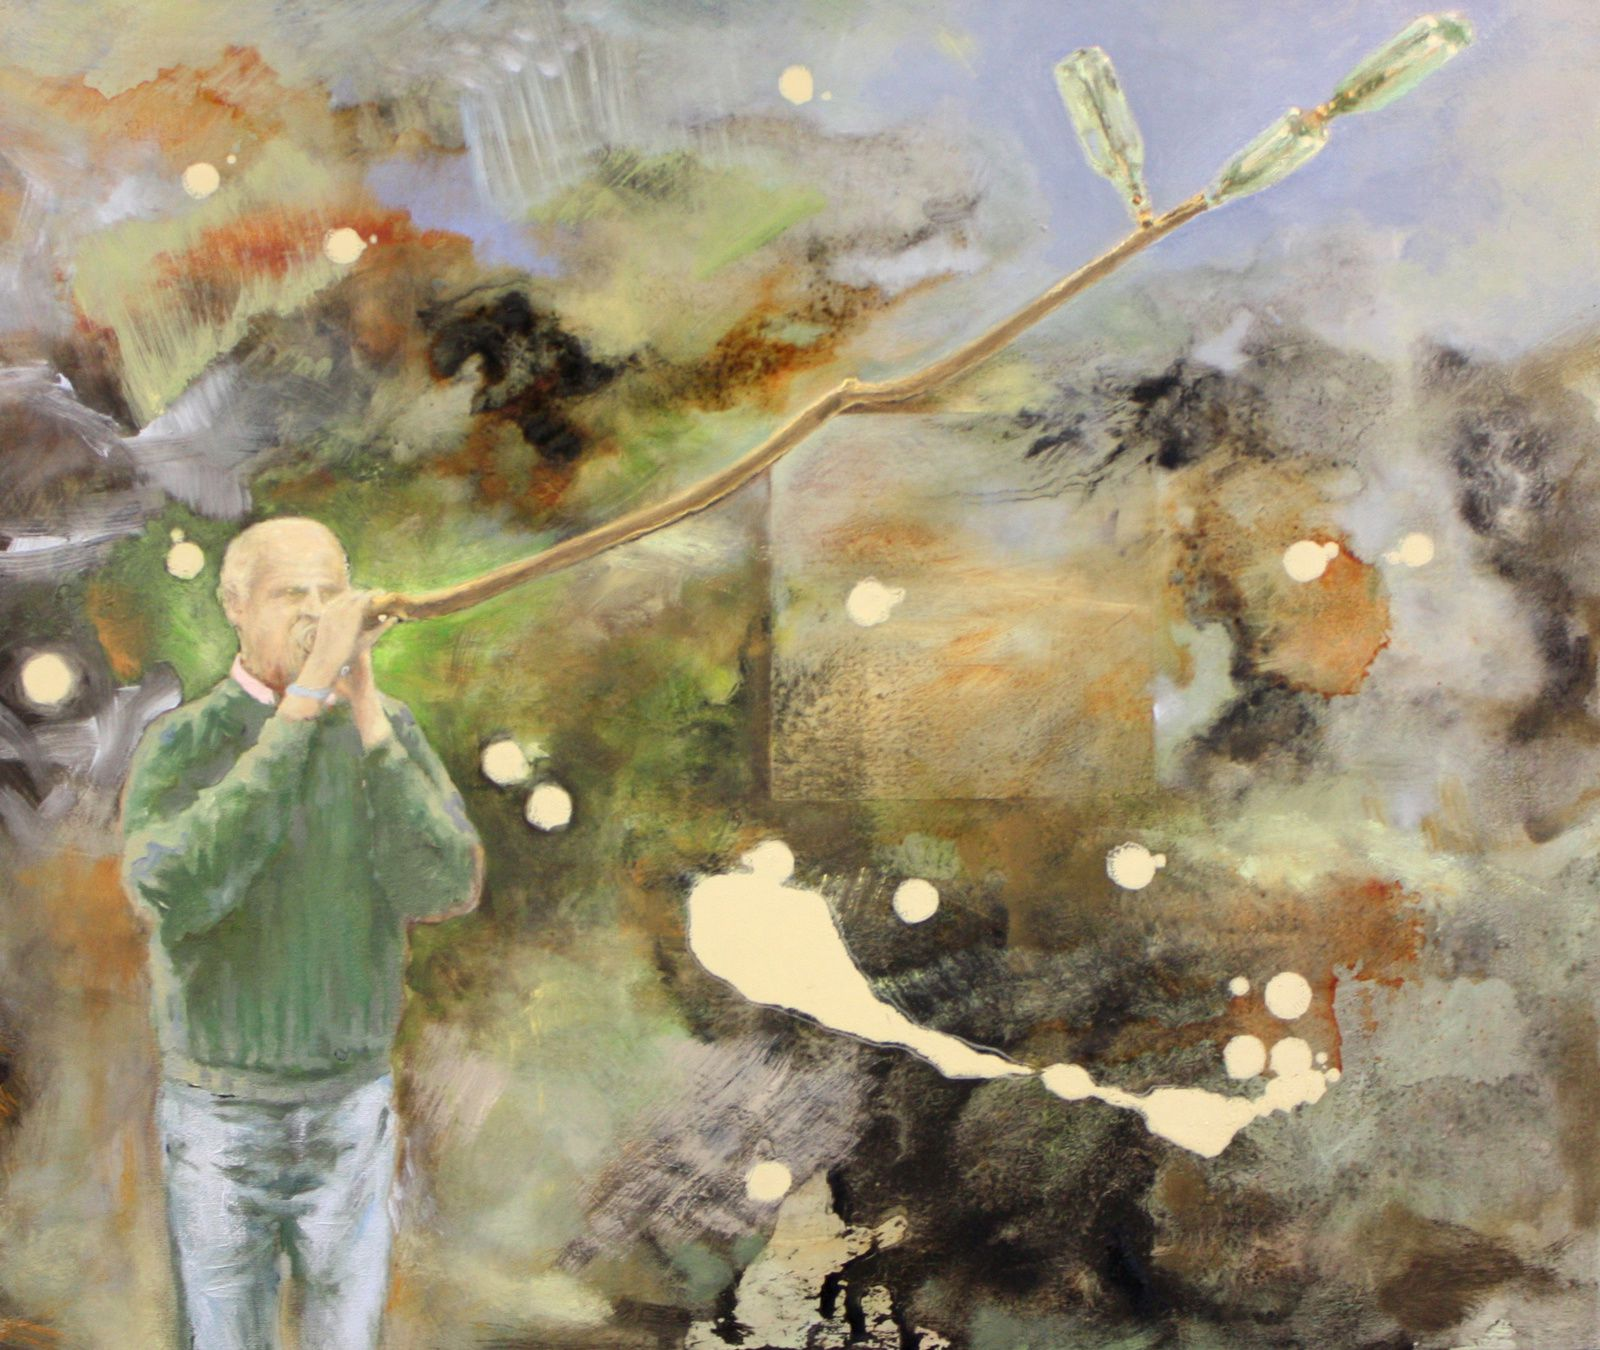 Exposition Peinture Contemporaine Bruno Perramant Le Ma Tre Des